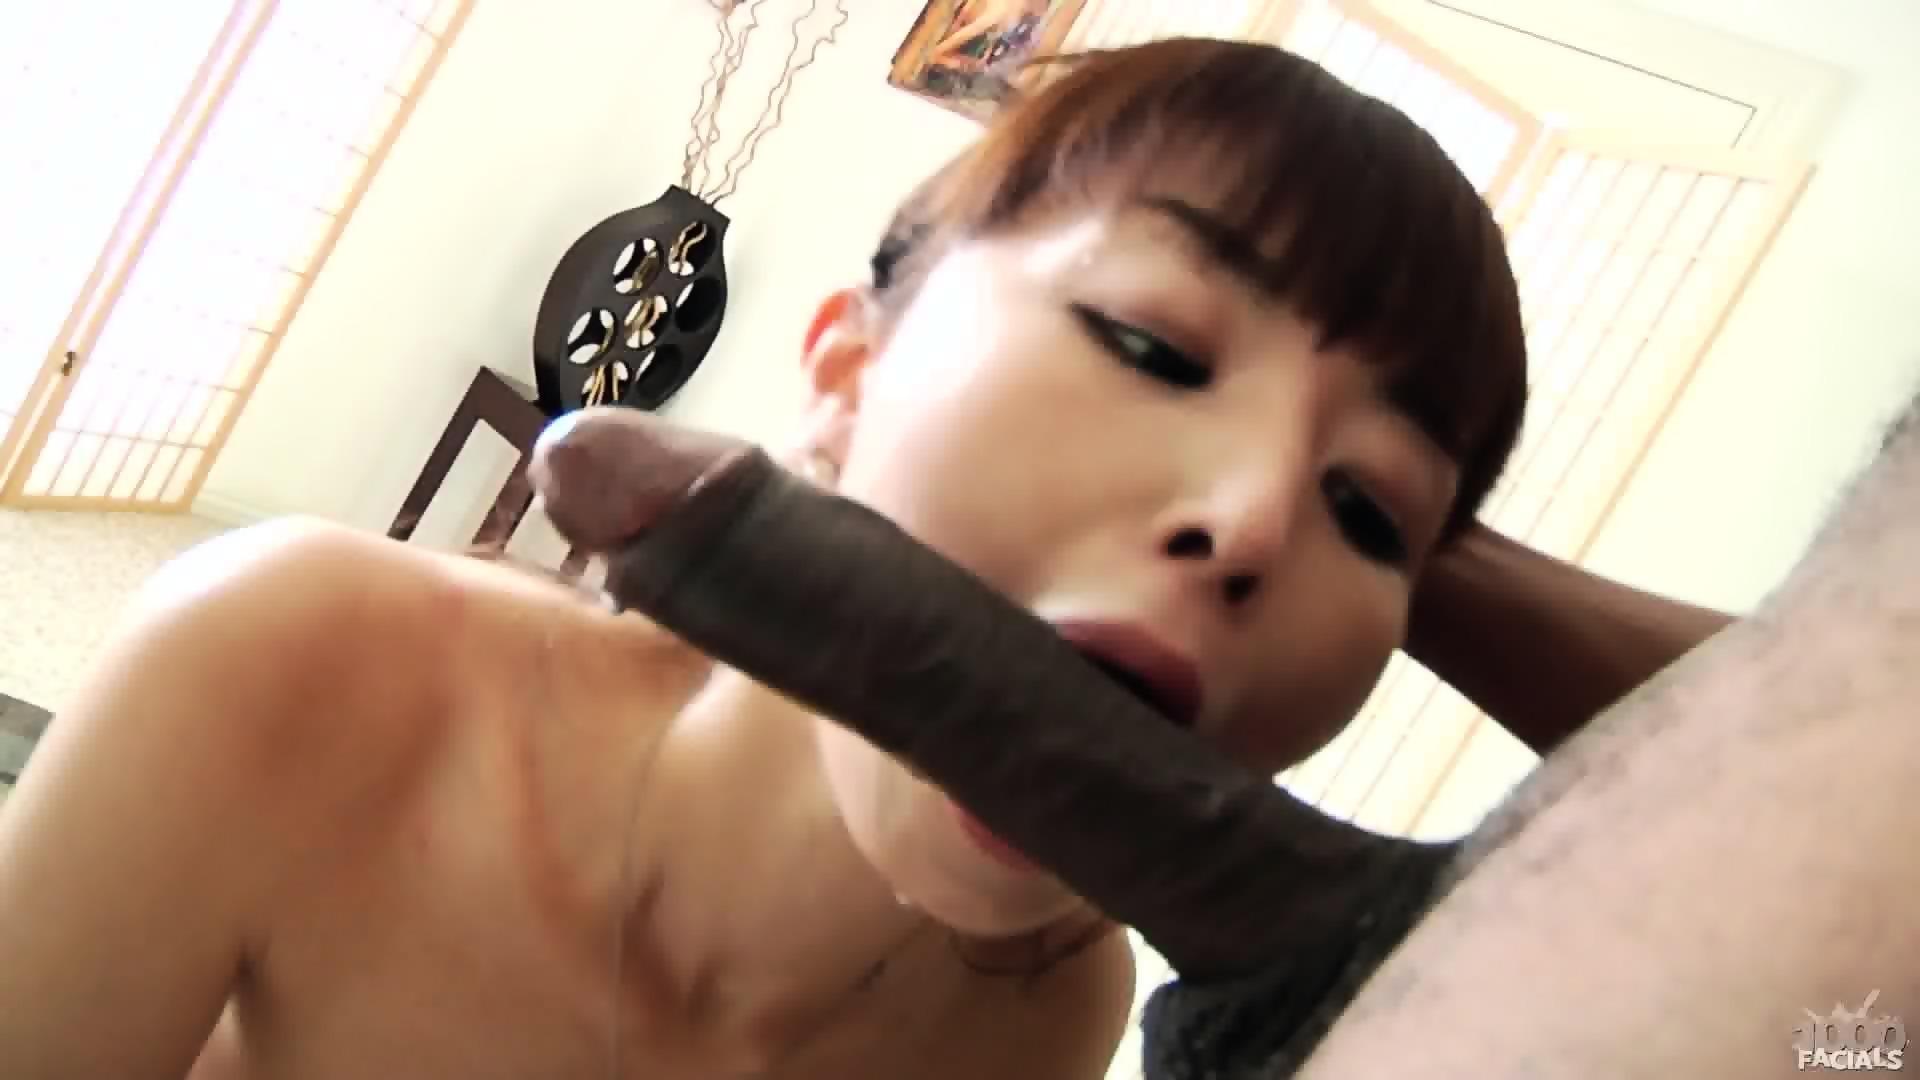 Large penetration hentai